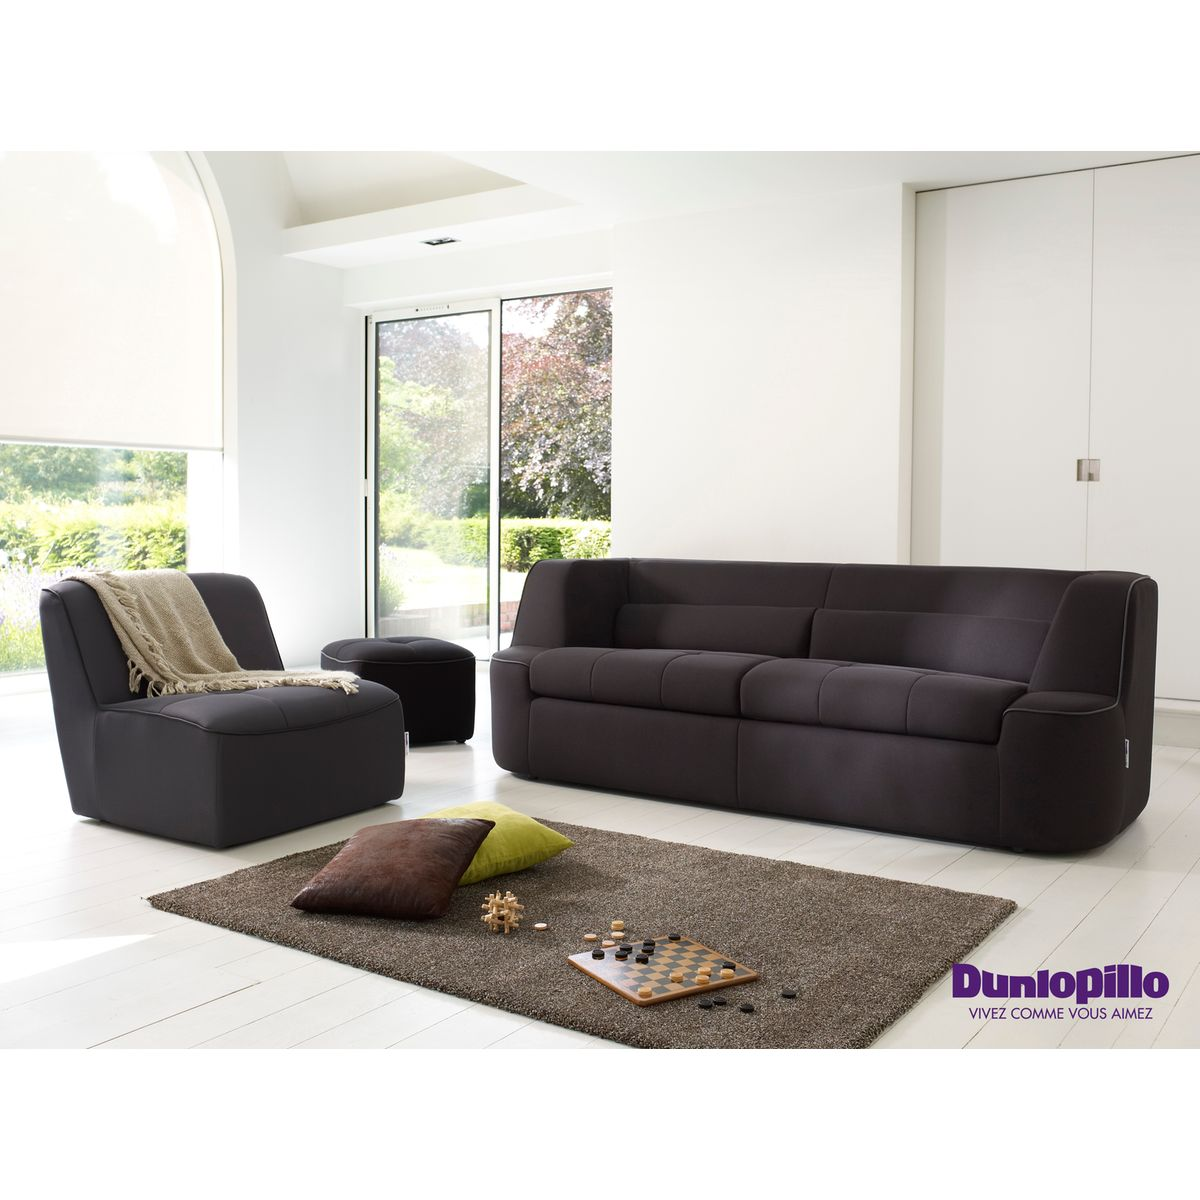 : Sofa XL Disponible en 3 coloris DUNLOPILLO Canapé droit